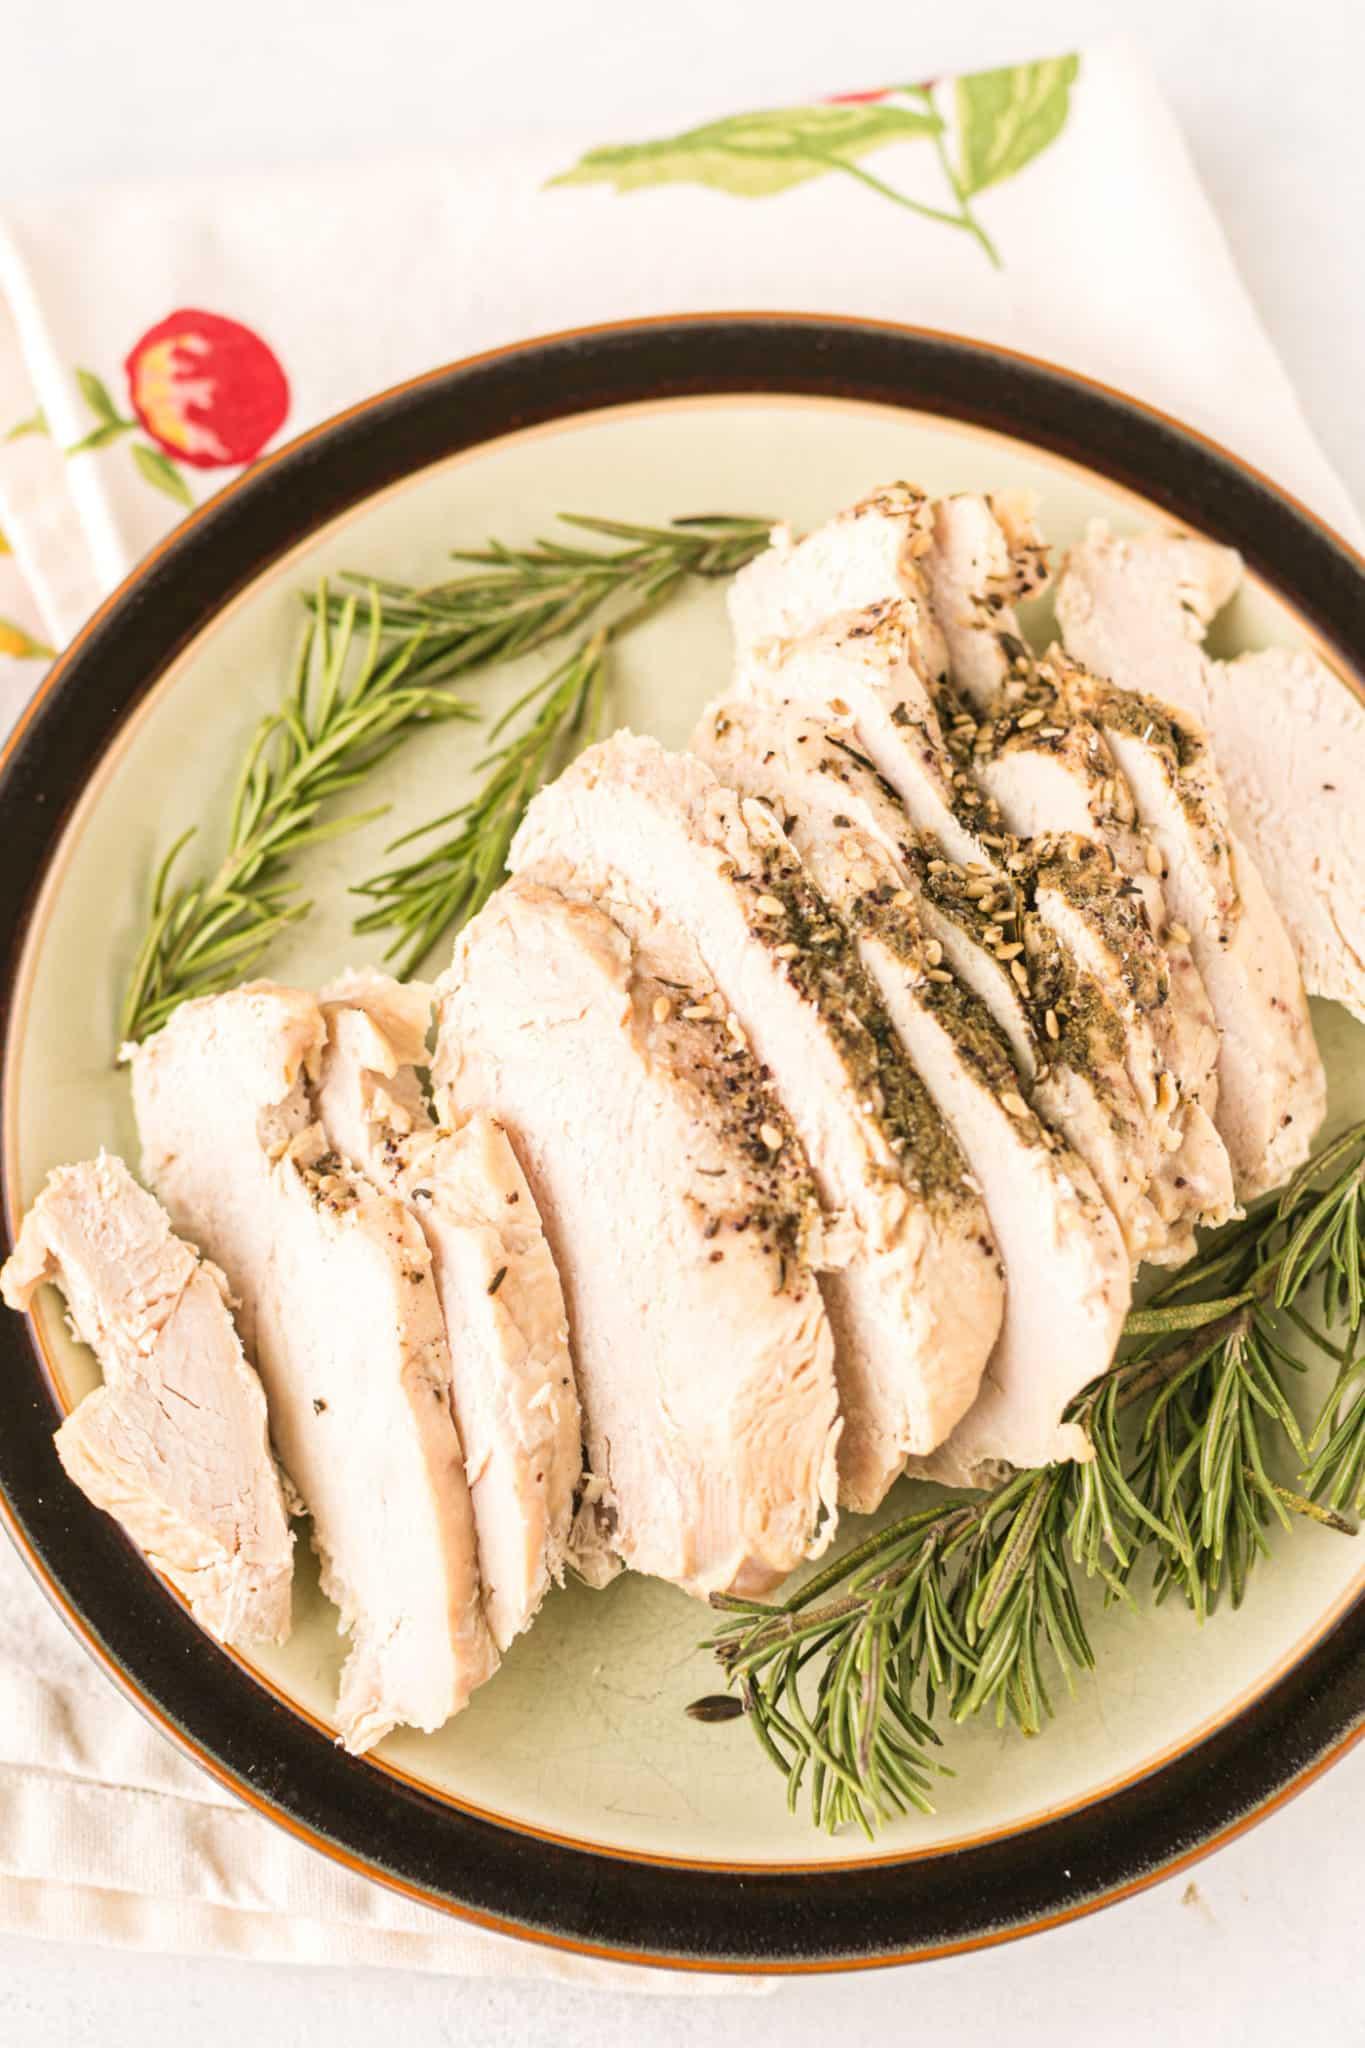 sliced boneless turkey breast on a plate